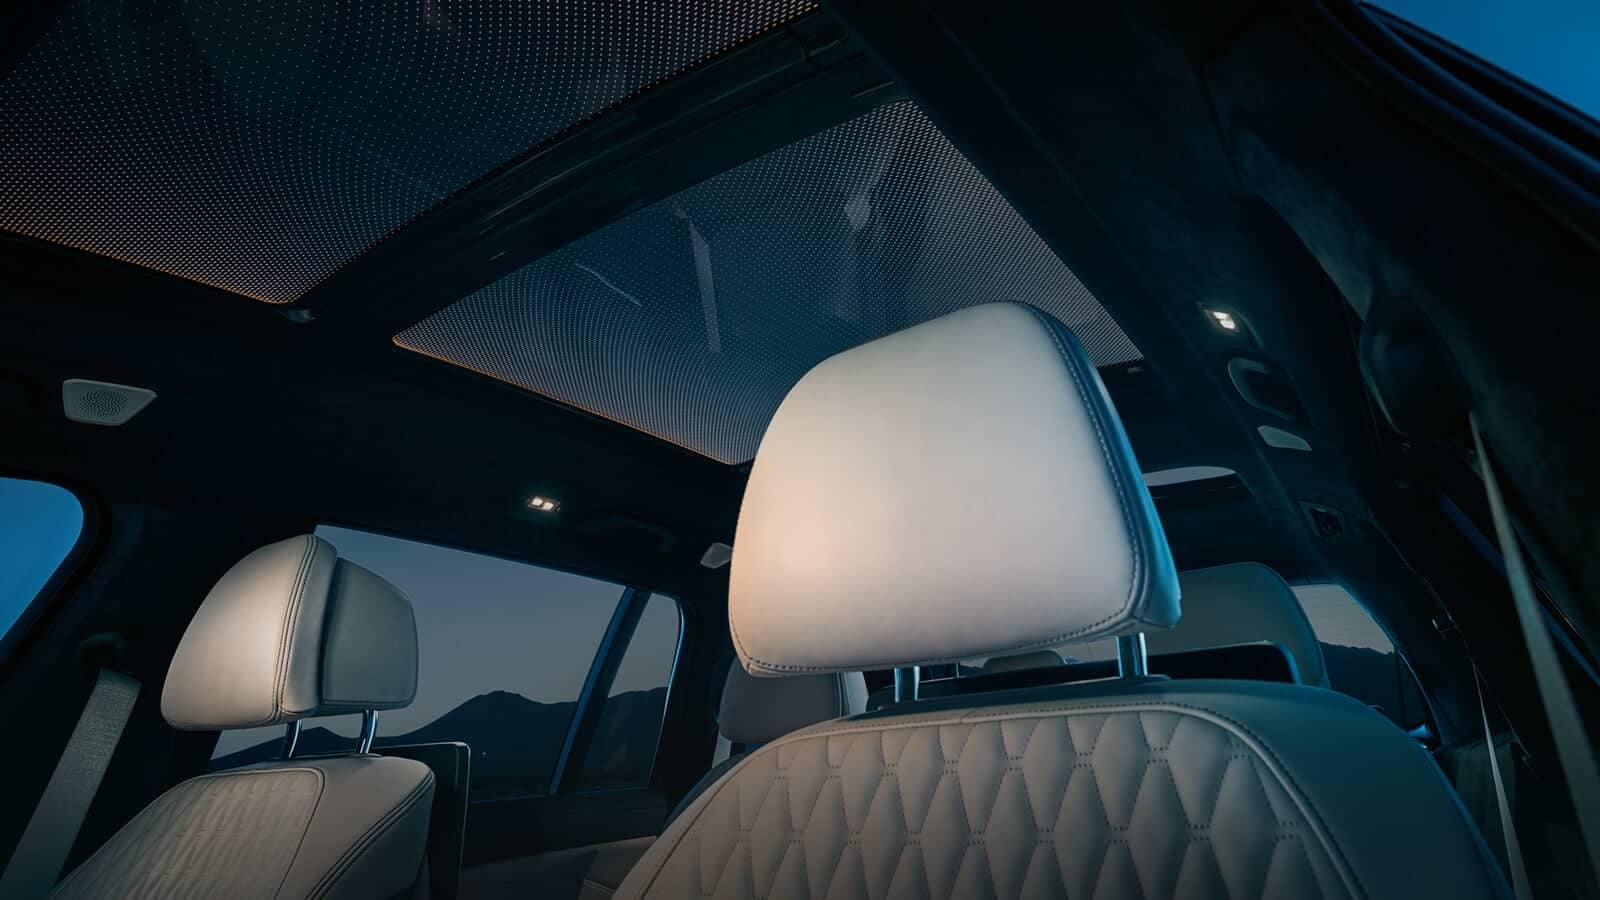 2019-BMW-X7-panoramic-sky-lounge